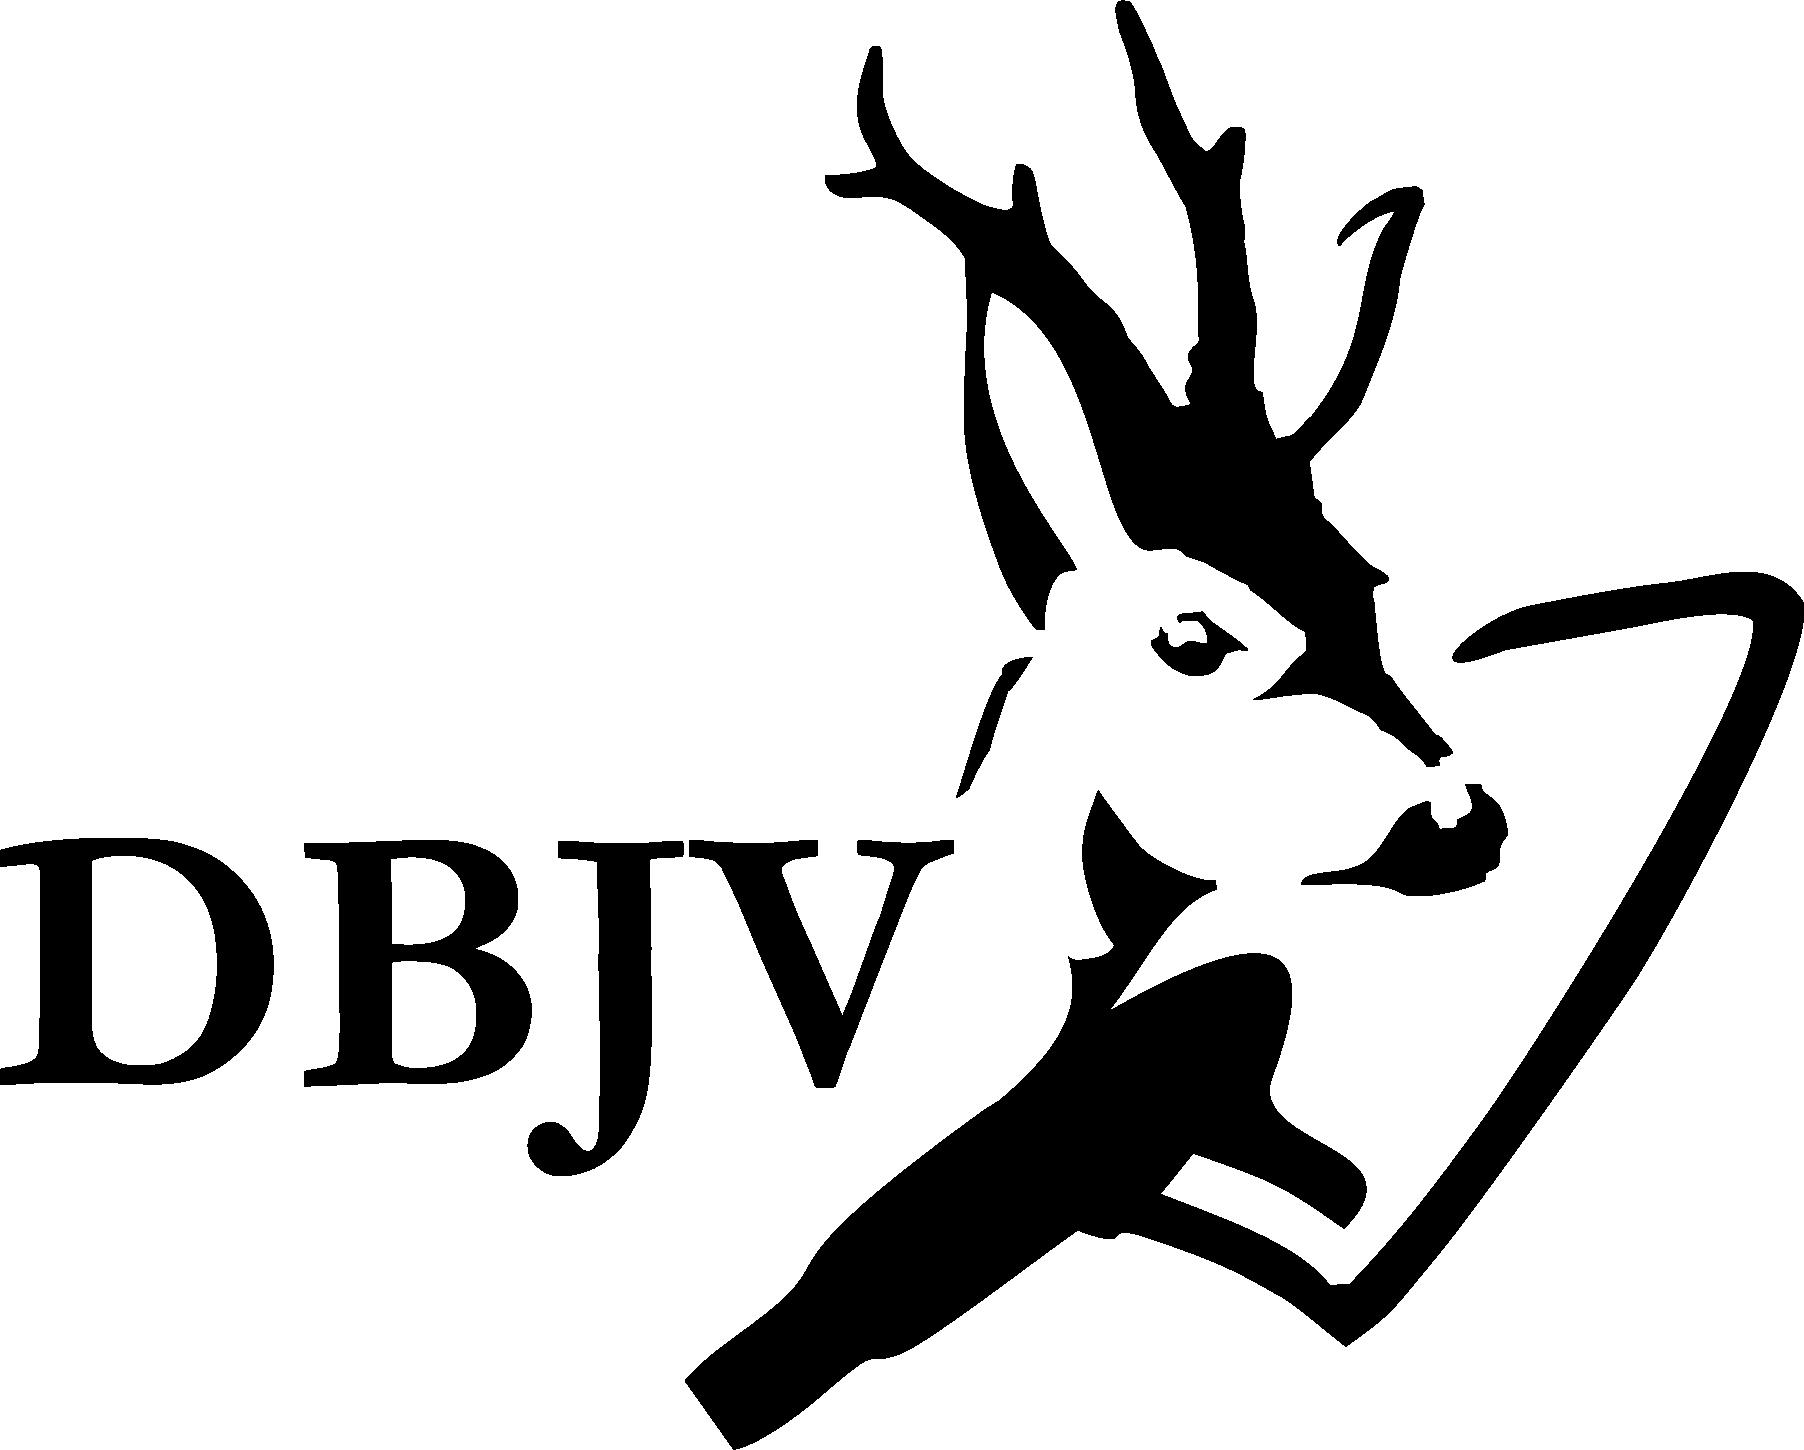 Bogenjagd | Deutscher Bogenjagd Verband e.V.